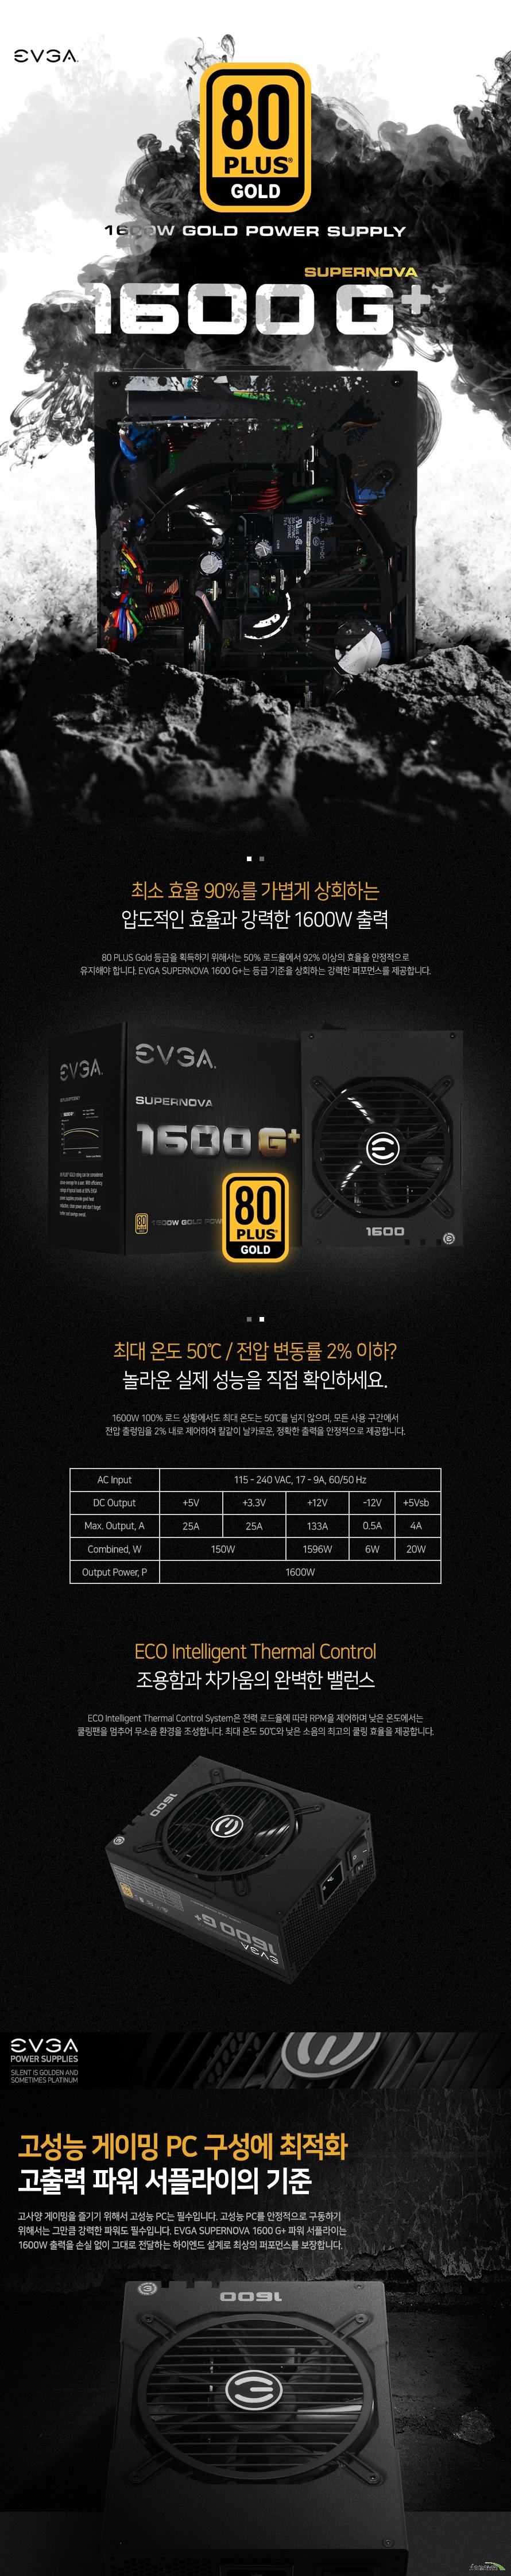 EVGA  SUPERNOVA 1600G+ 80PLUS GOLD